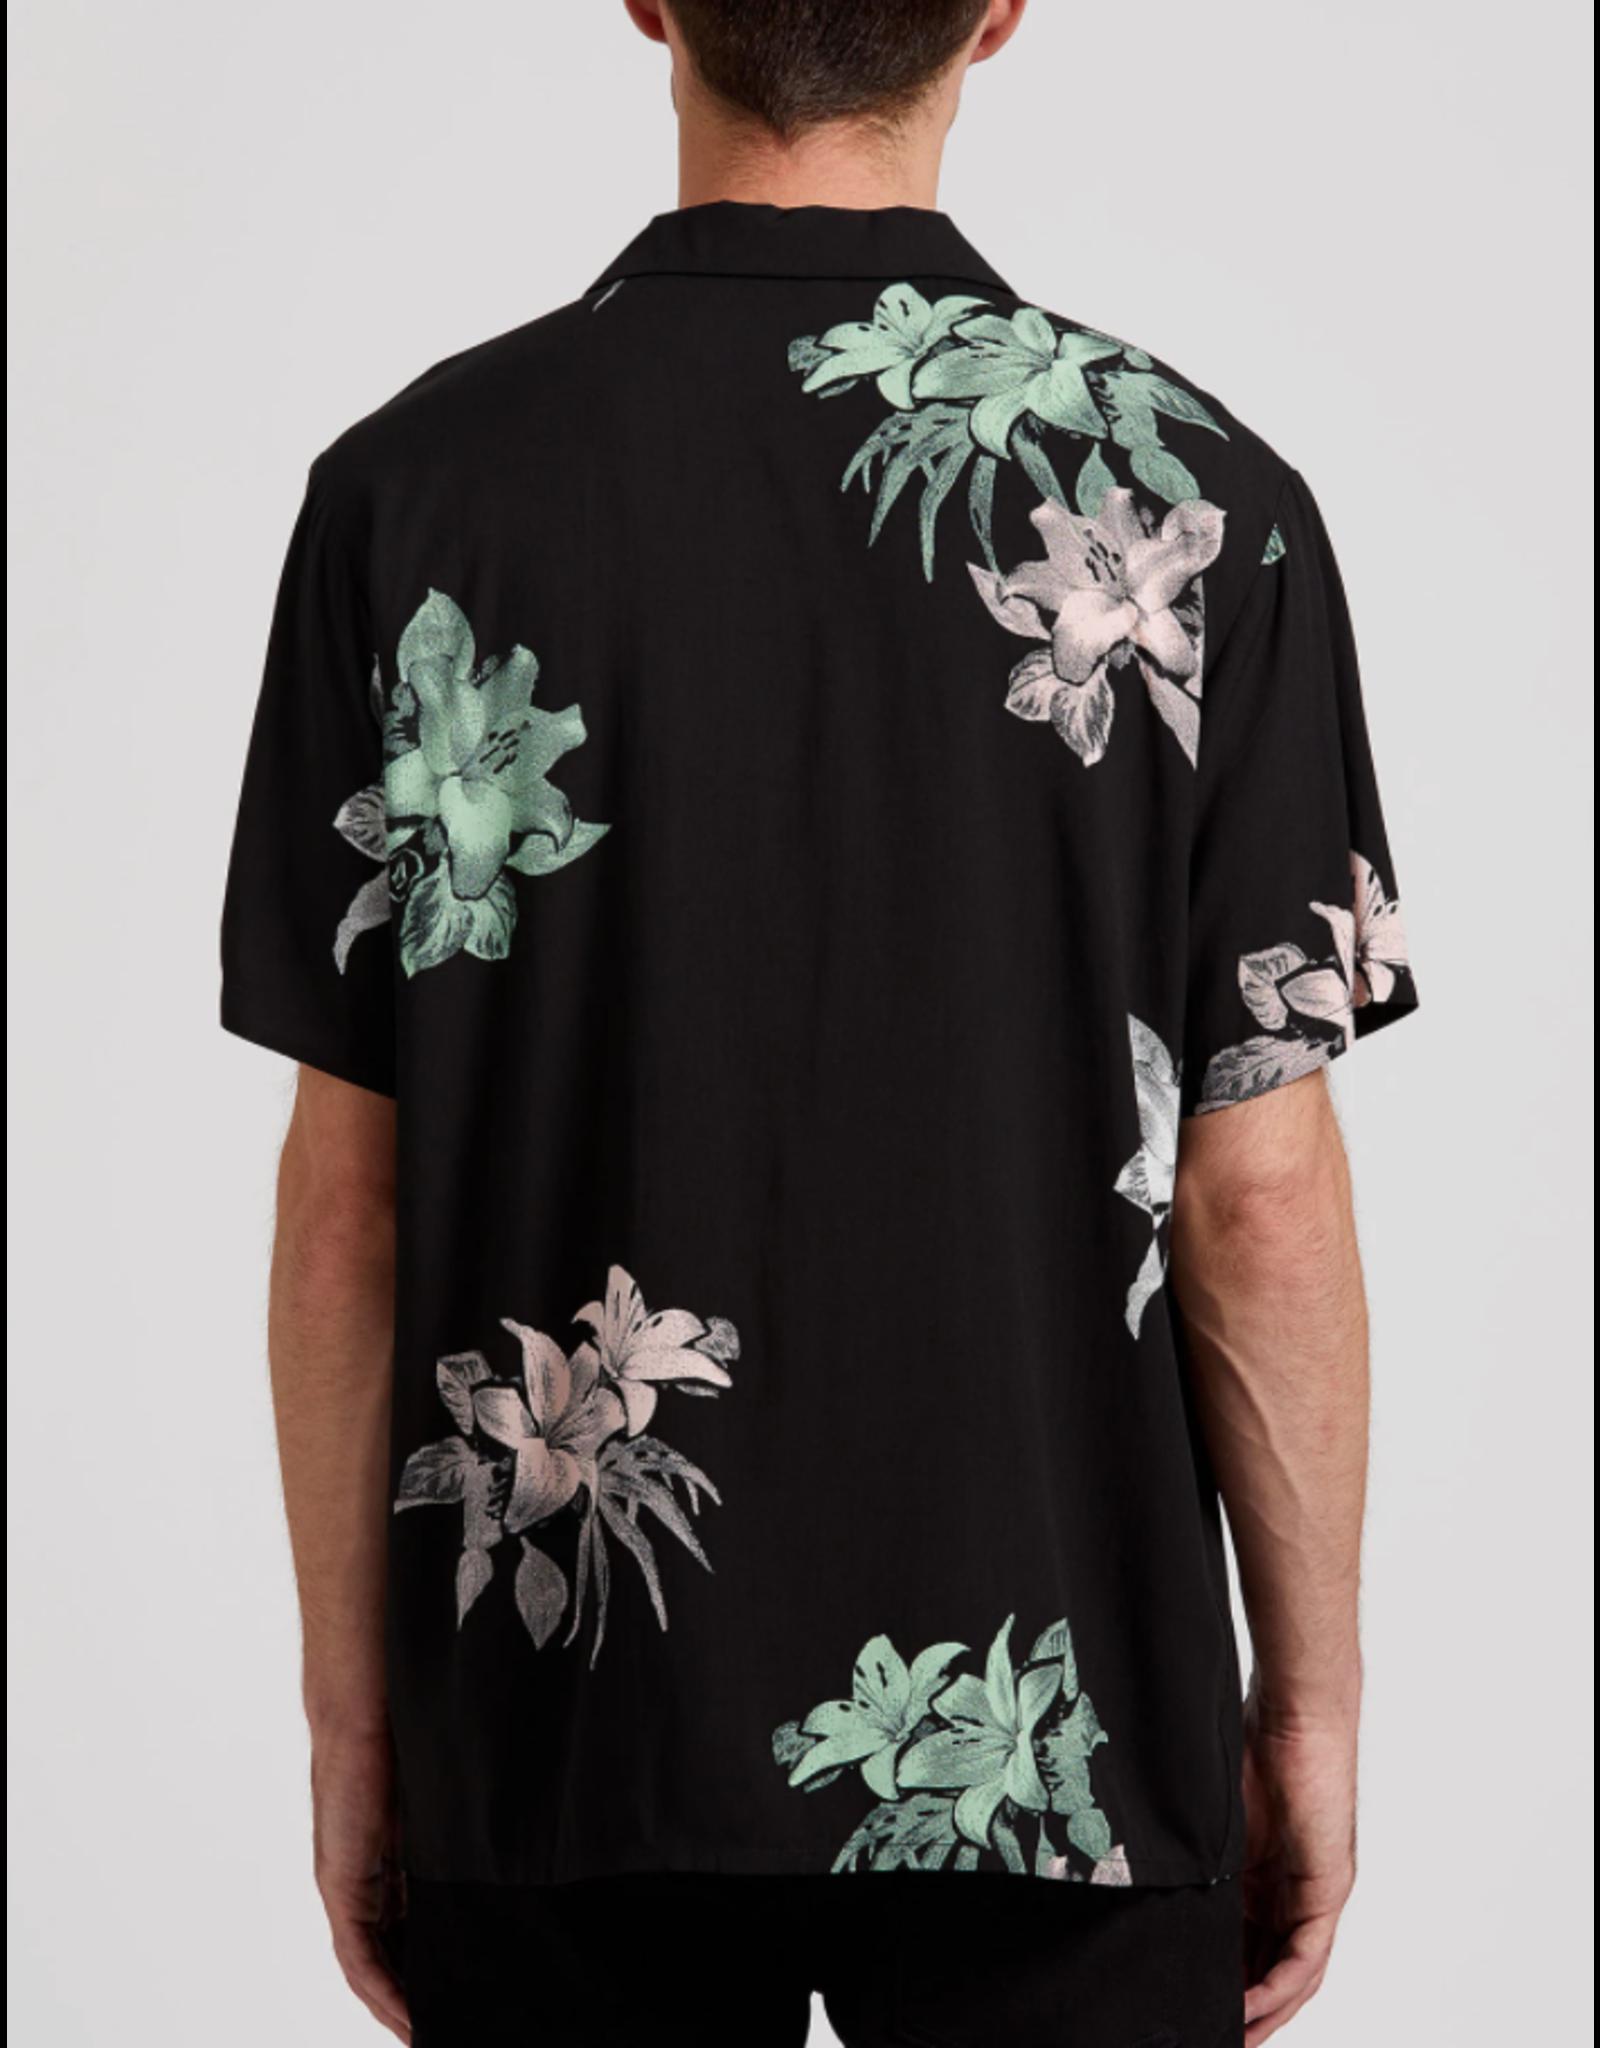 Volcom Richardt Short Sleeve Shirt - Black